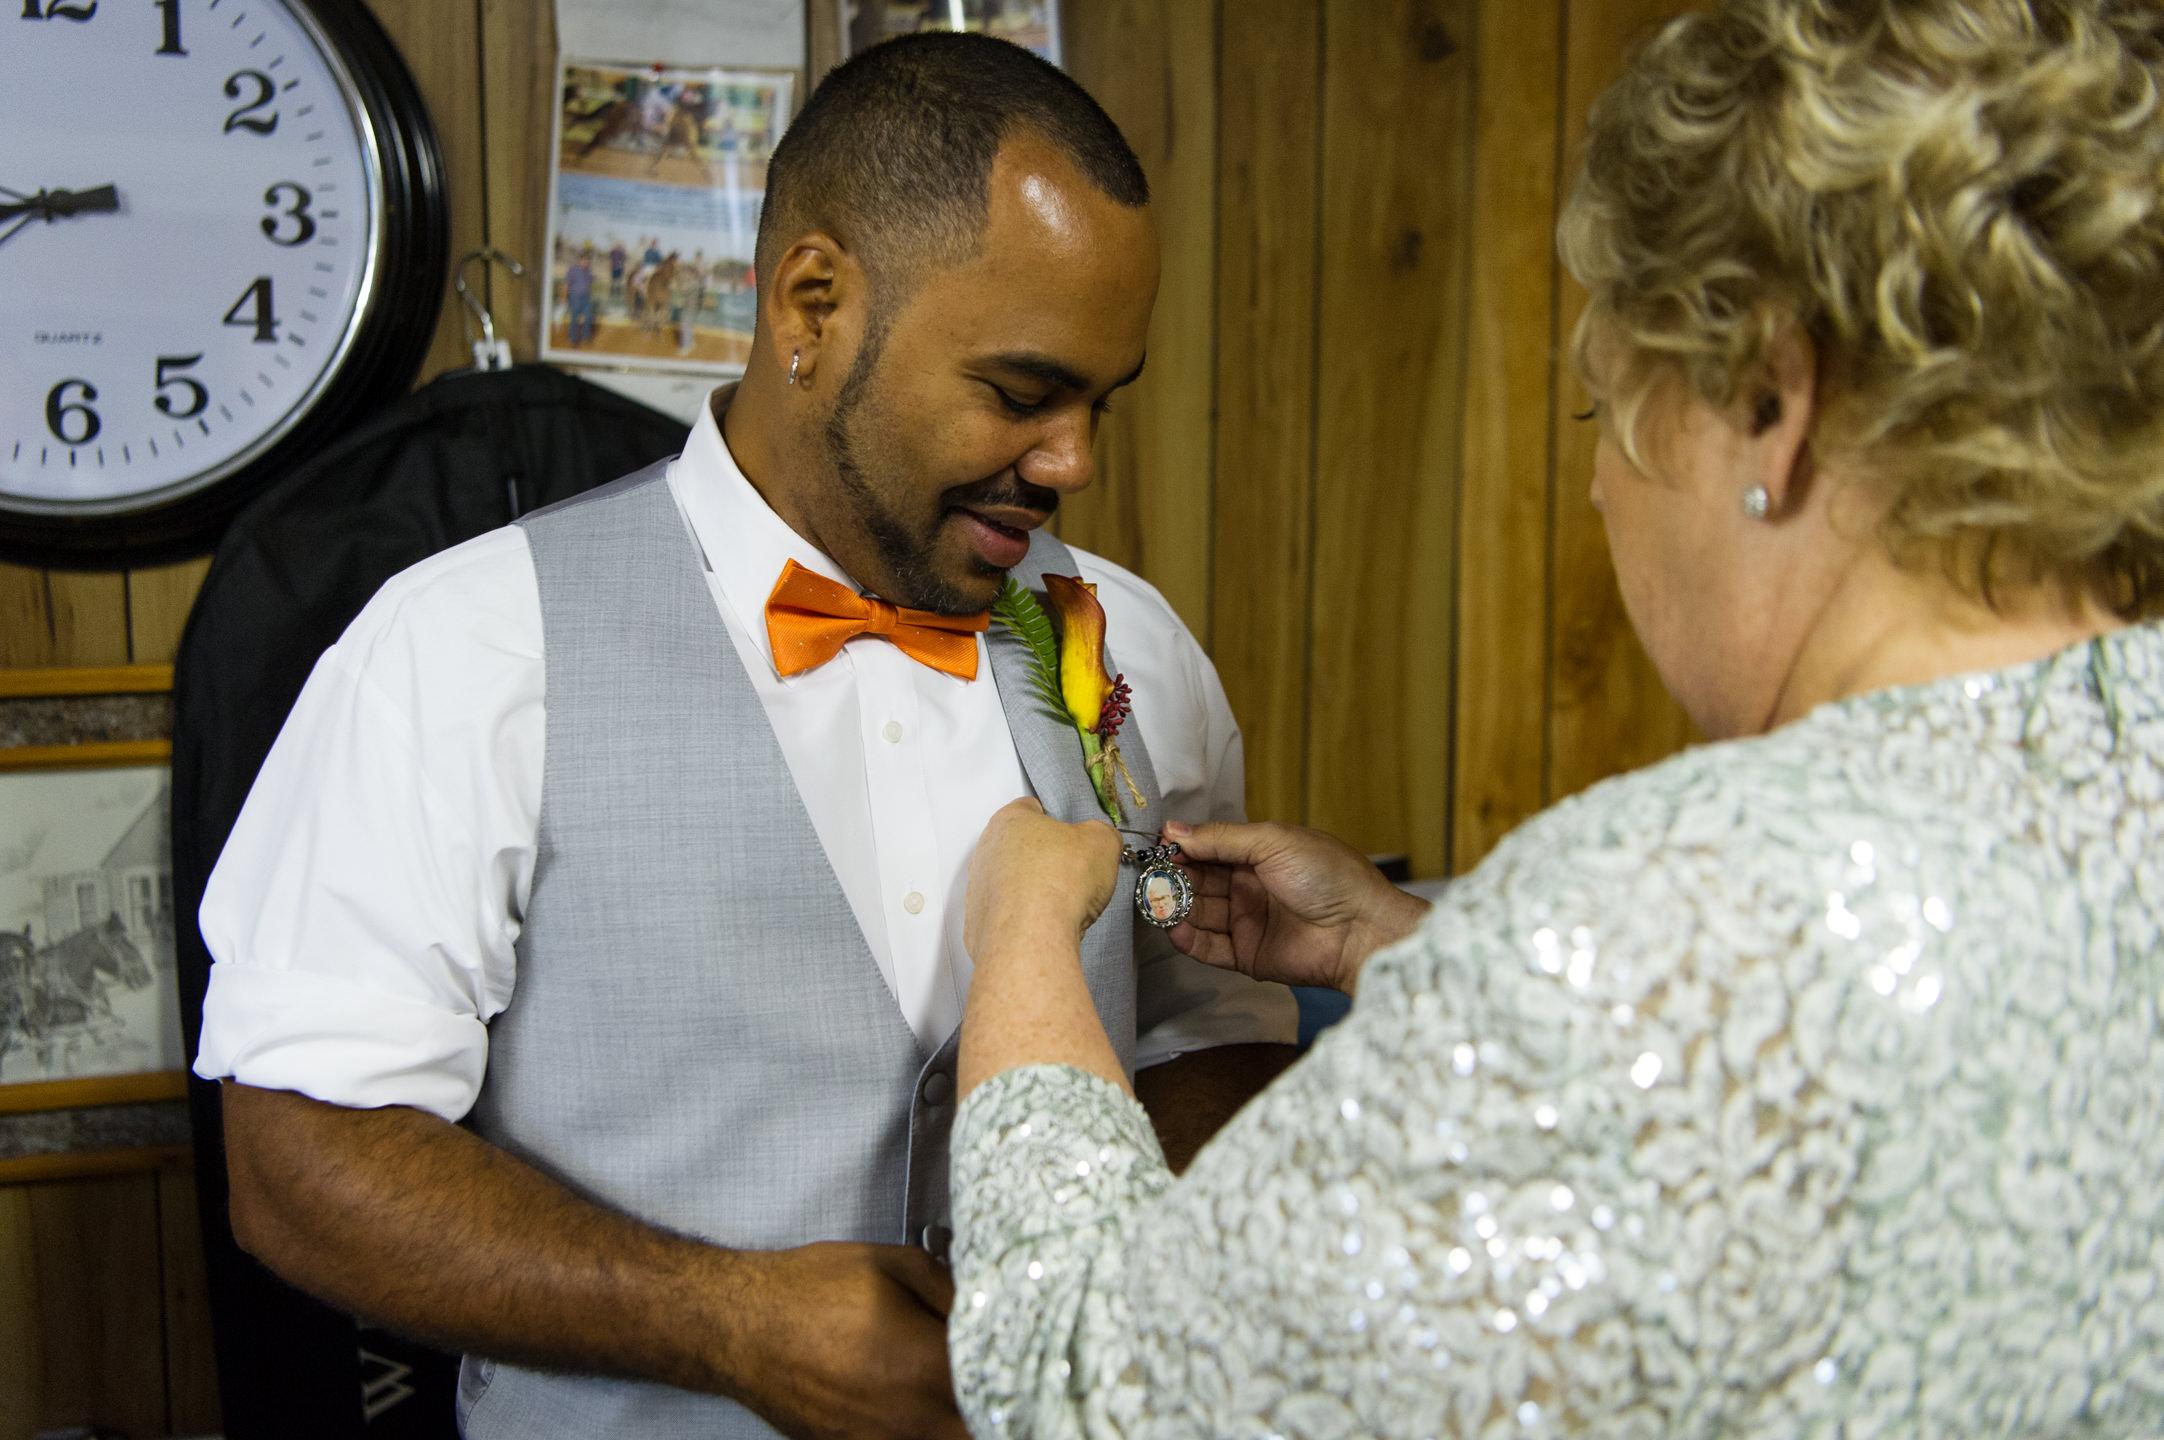 20160917_Tat_Renee and Marcus Wedding-9.jpg